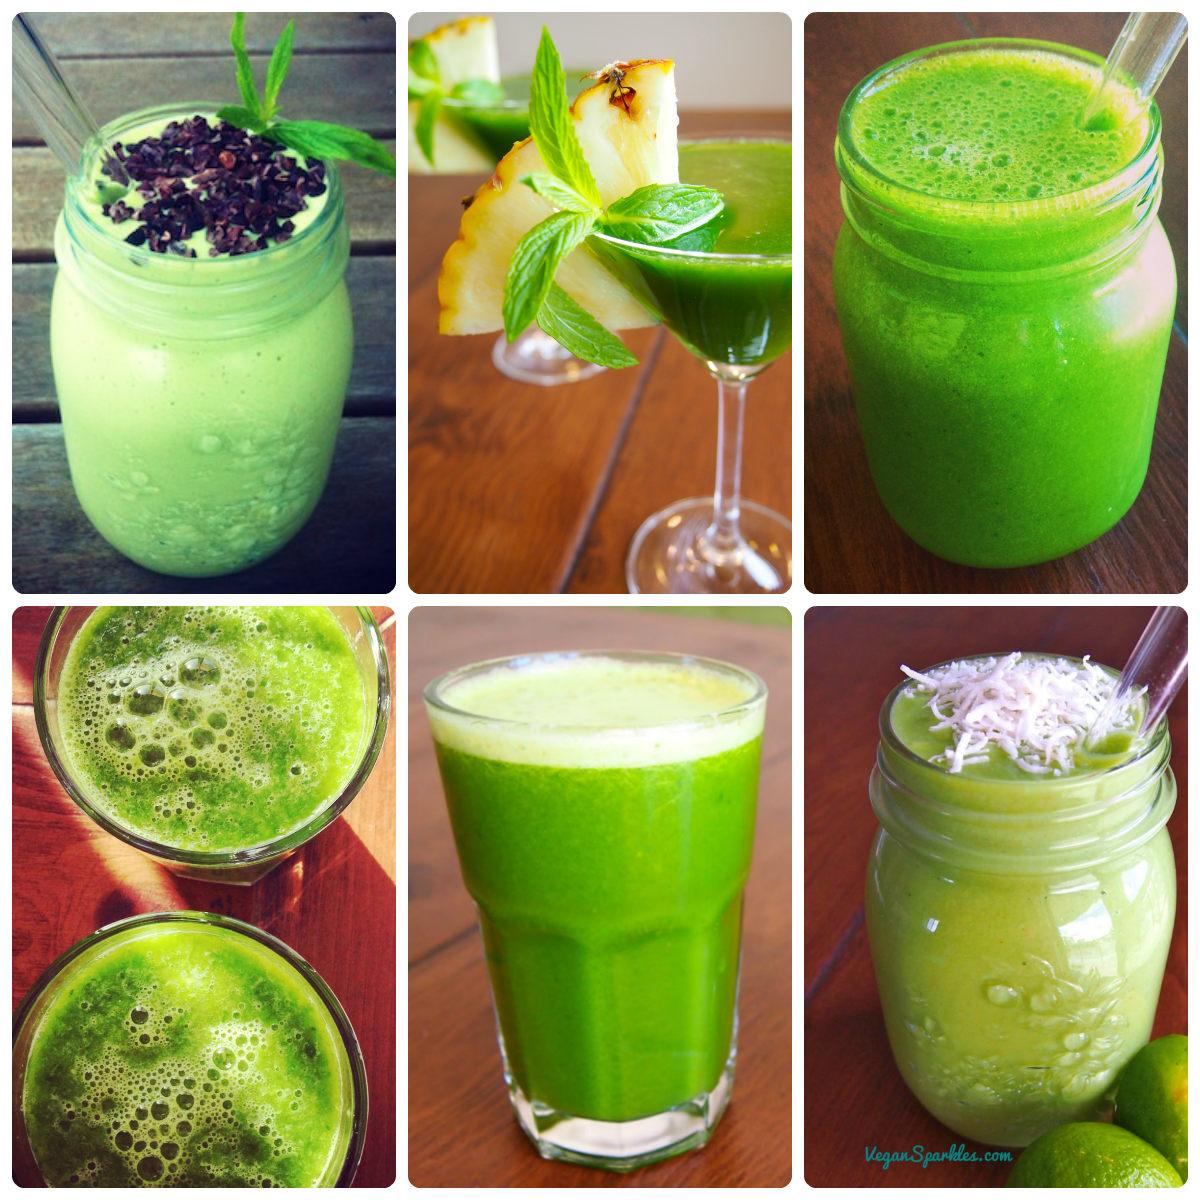 Supreme Rebecca Weller St Patrick S Day Drinks Food St Patrick S Day Drinks Green Drinks Jameson St Day Vegan Sparkles nice food St Patricks Day Drinks